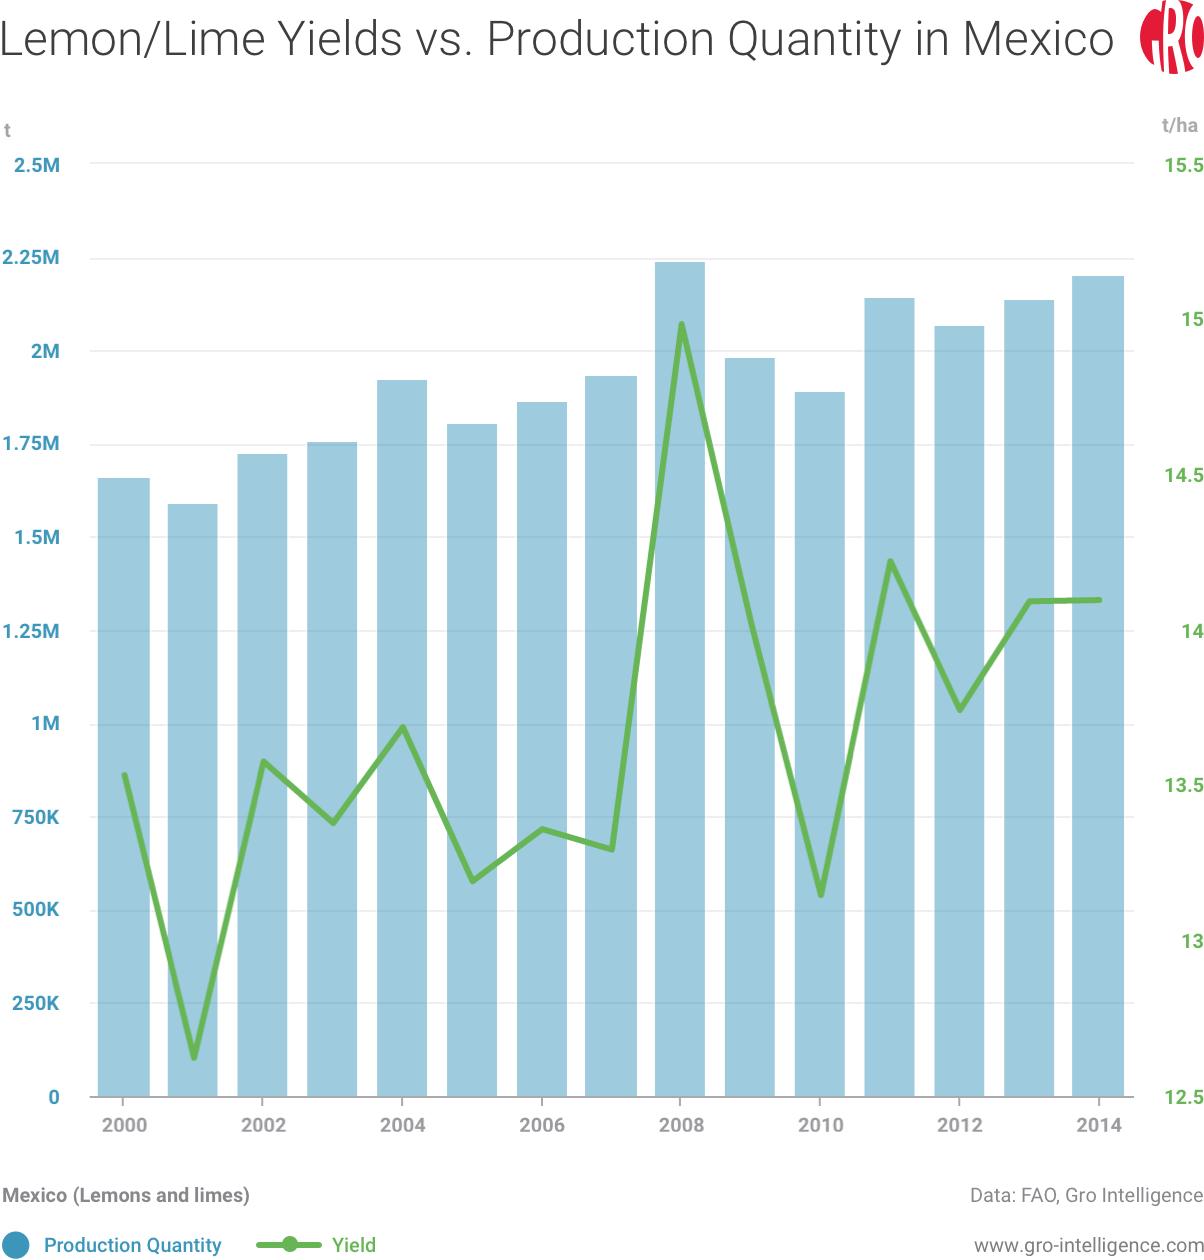 Lime Yields vs. Production Quantity